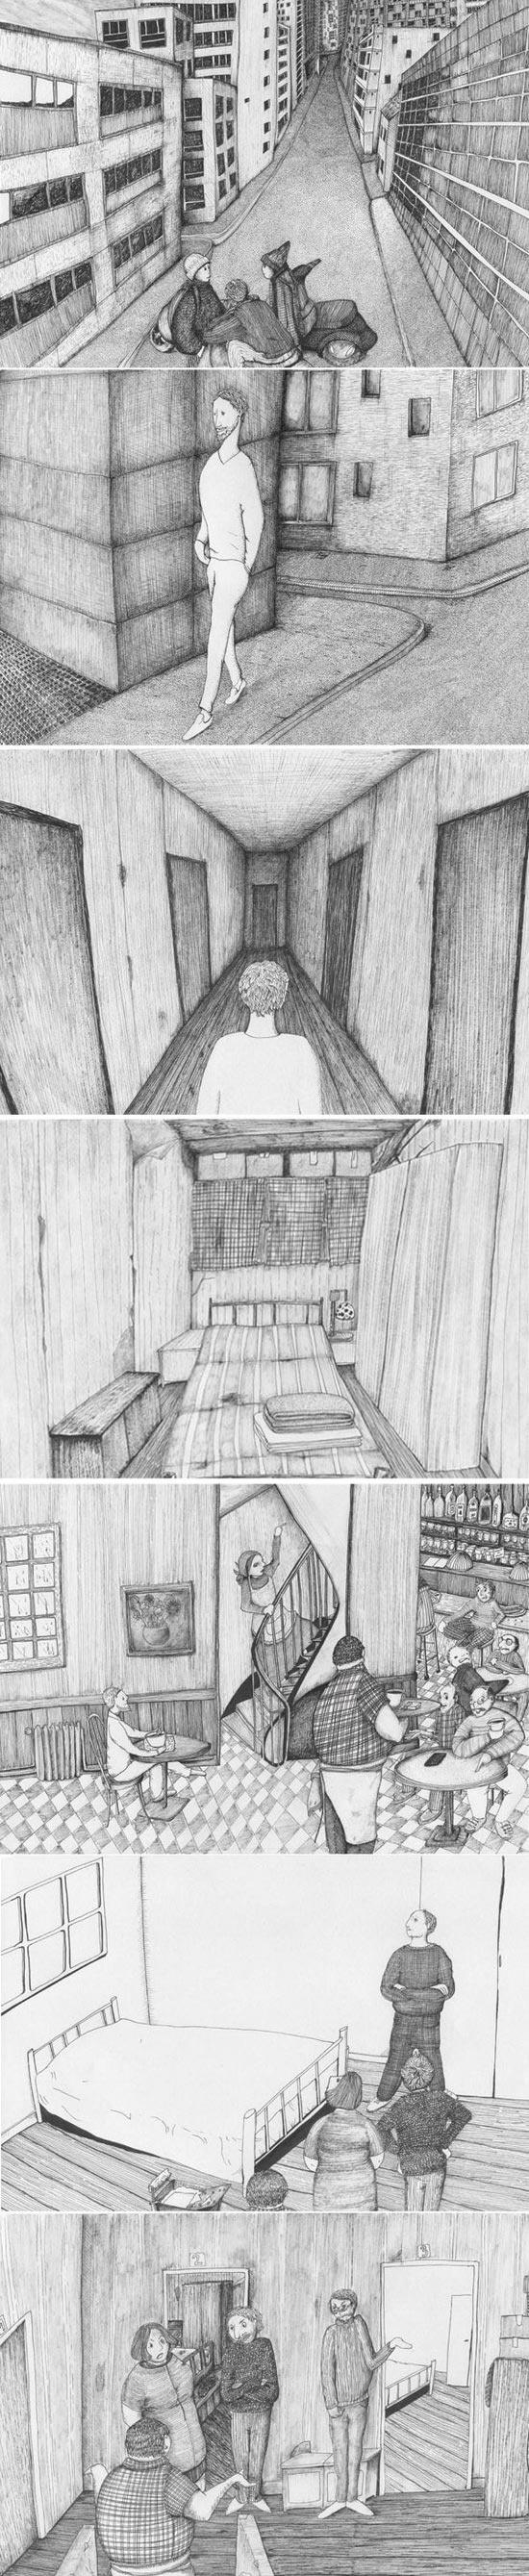 http://www.boumbang.com/lili-wood/ Lili Wood, projet insitus ©